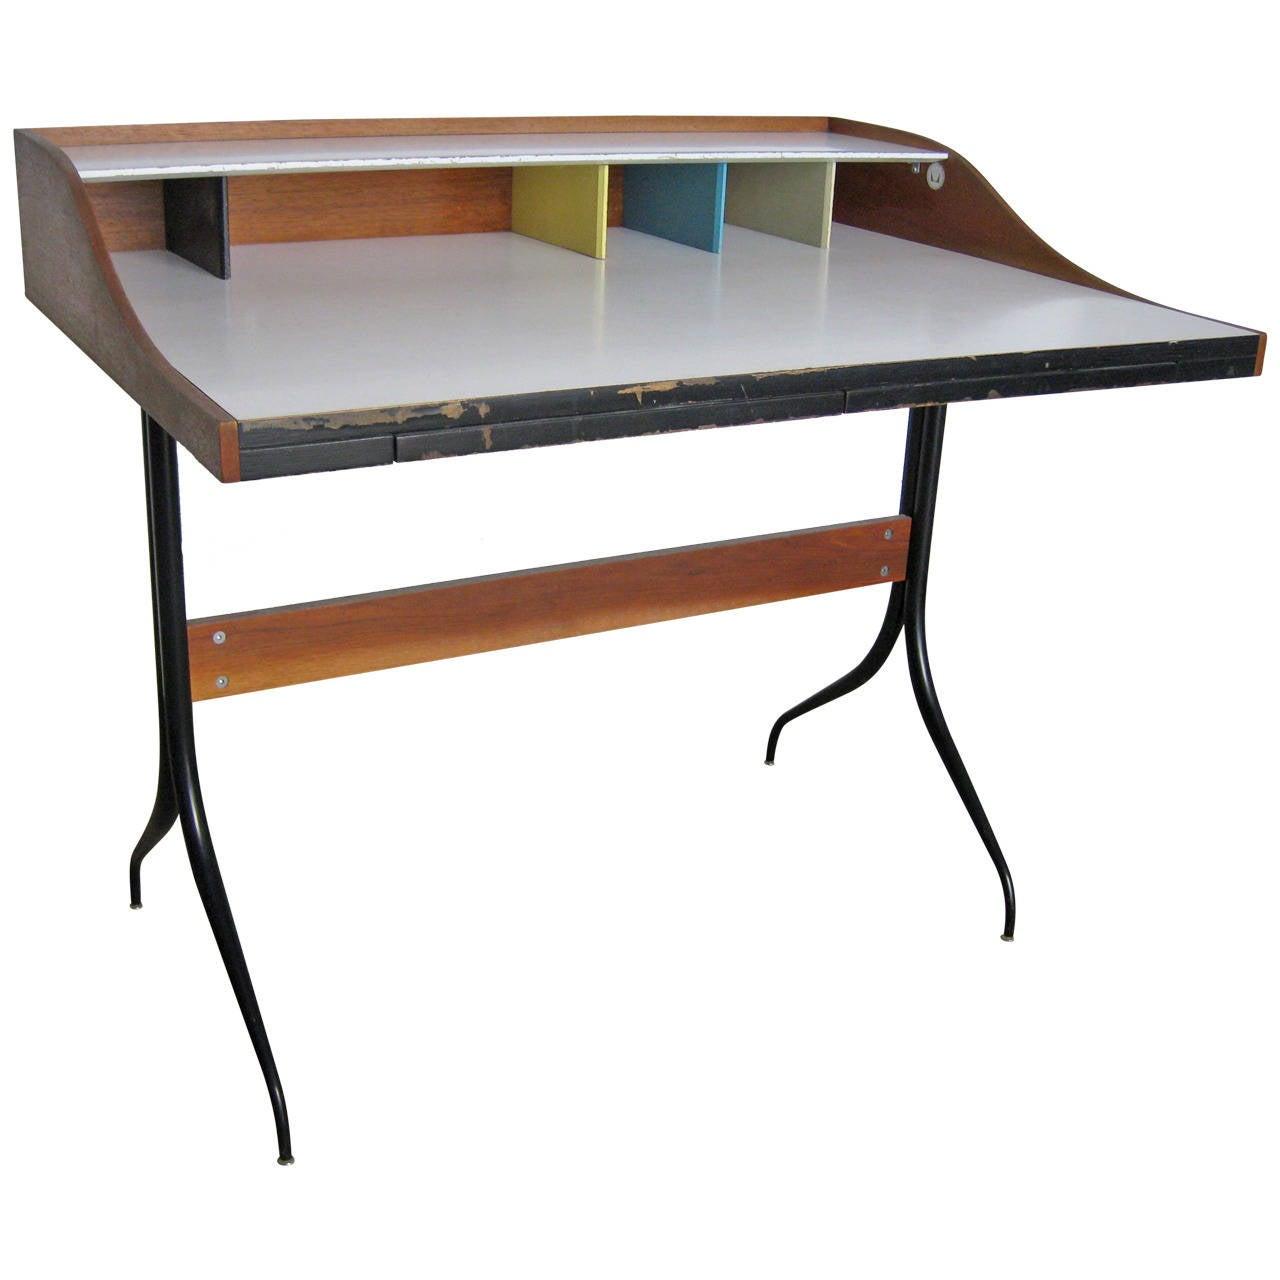 George Nelson Swaged-Leg desk